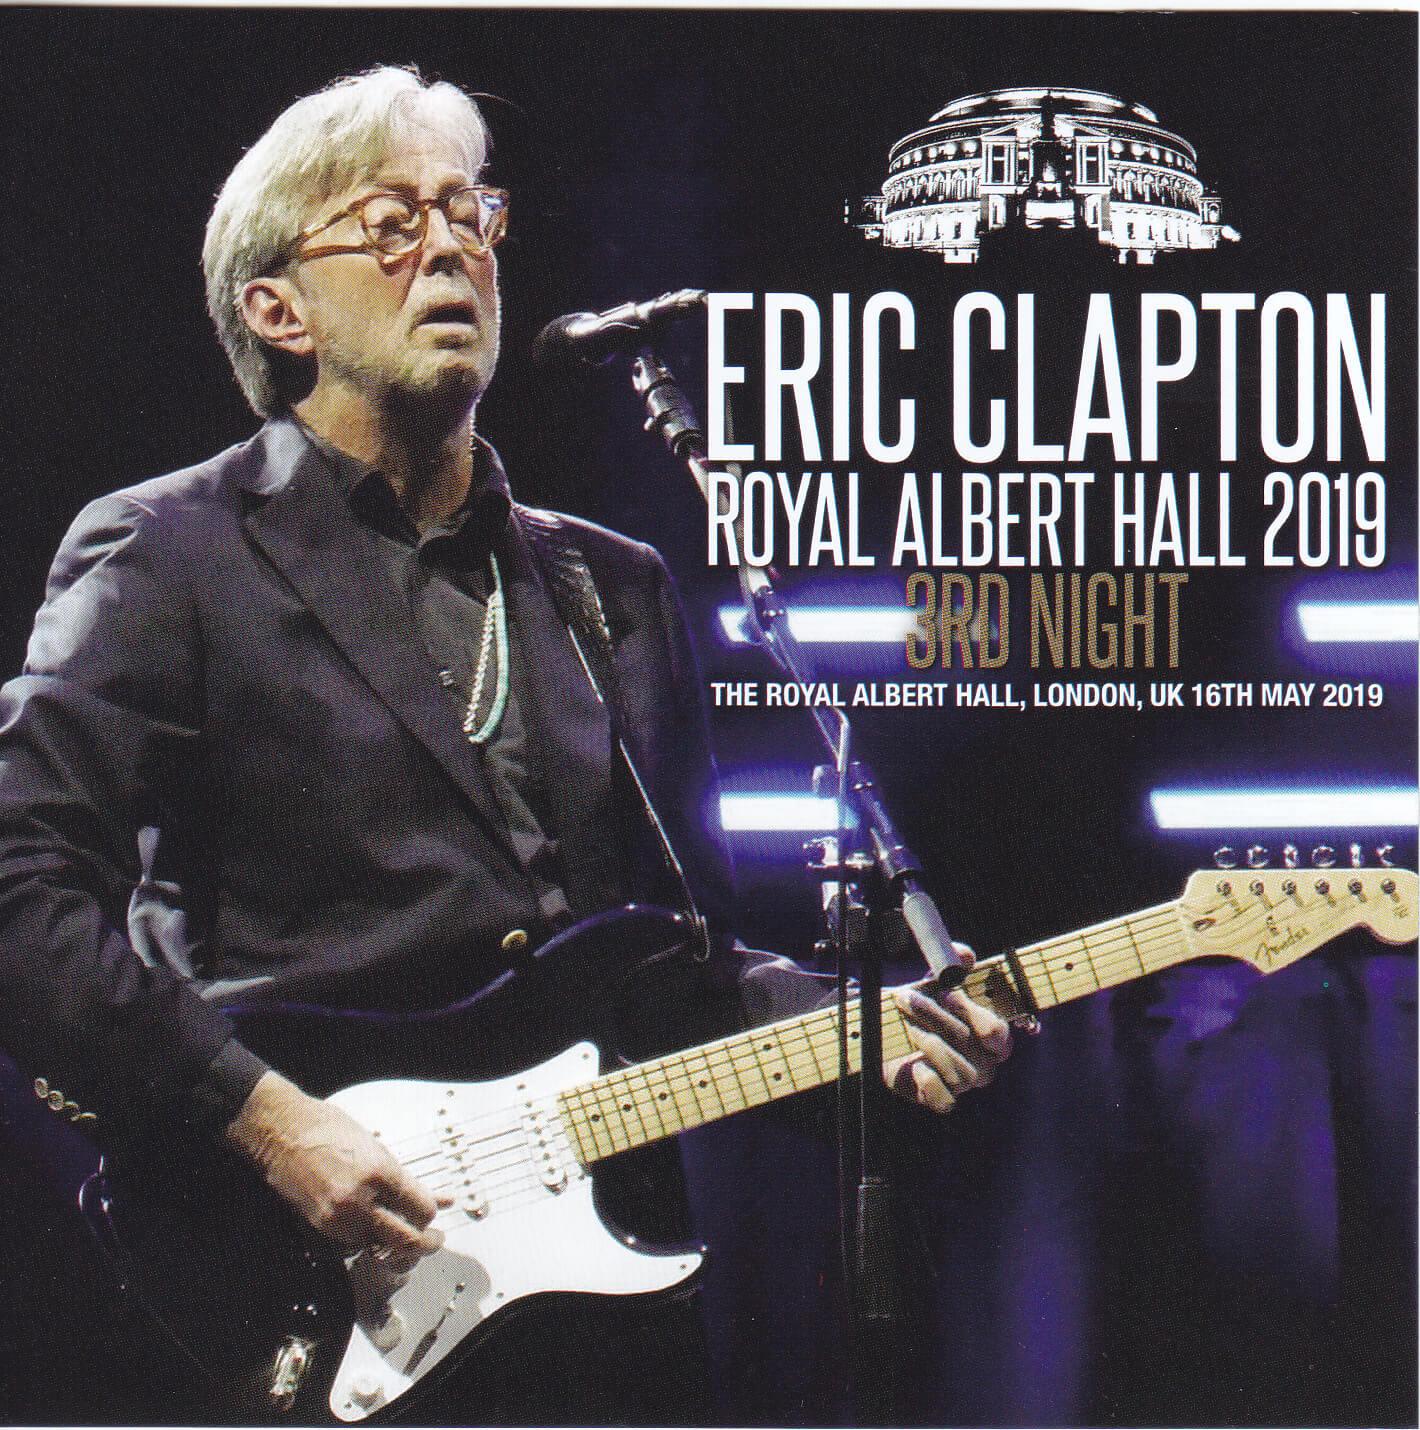 Eric Clapton 2019